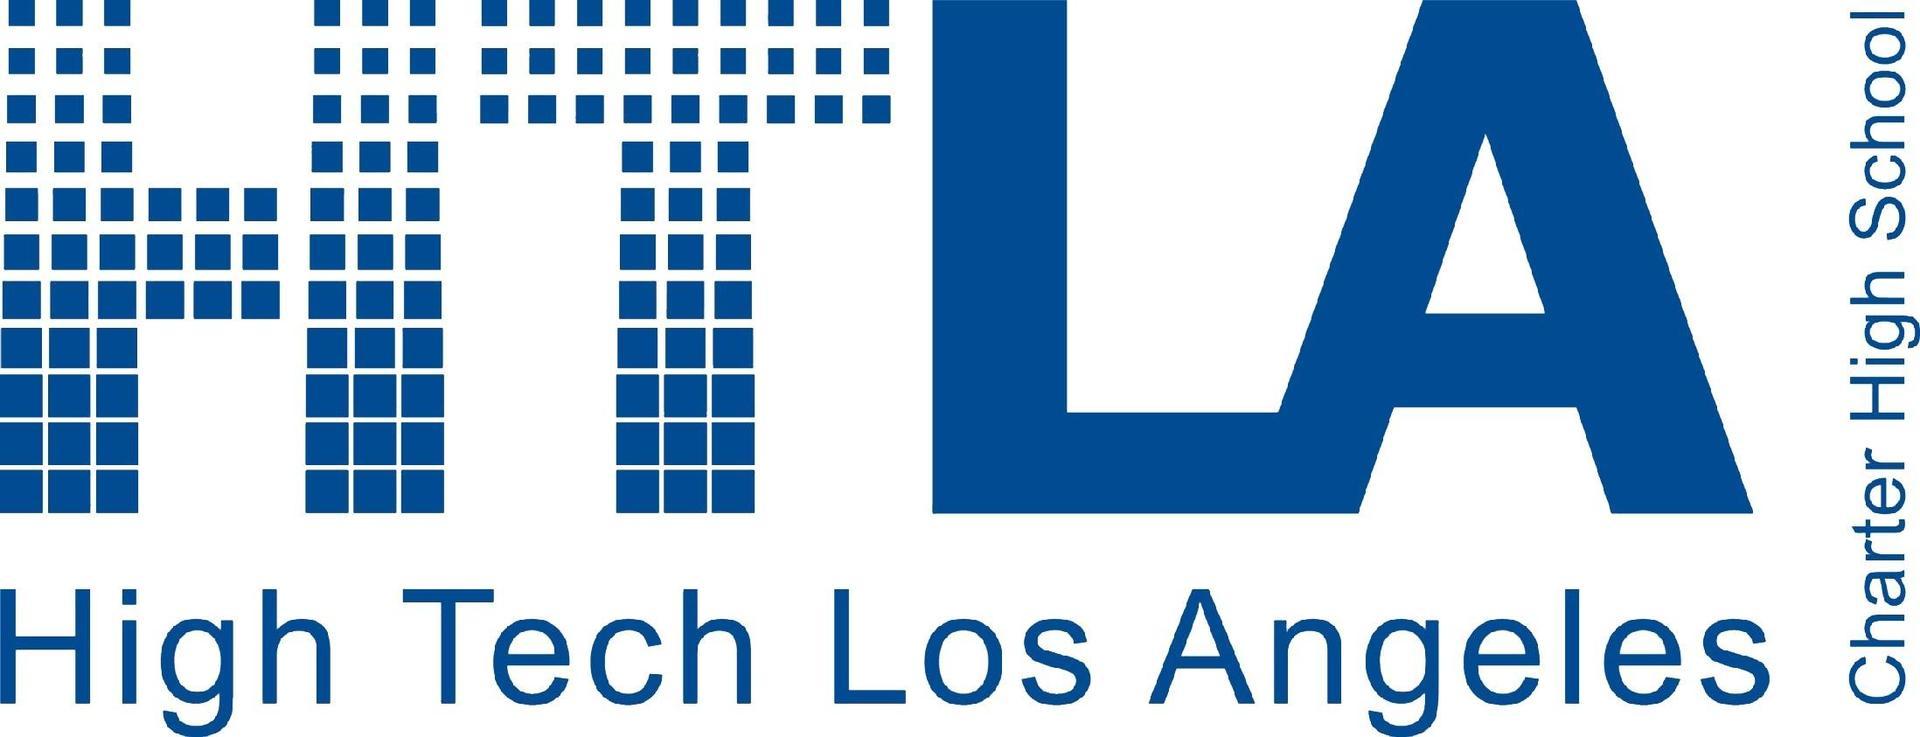 HTLA logo